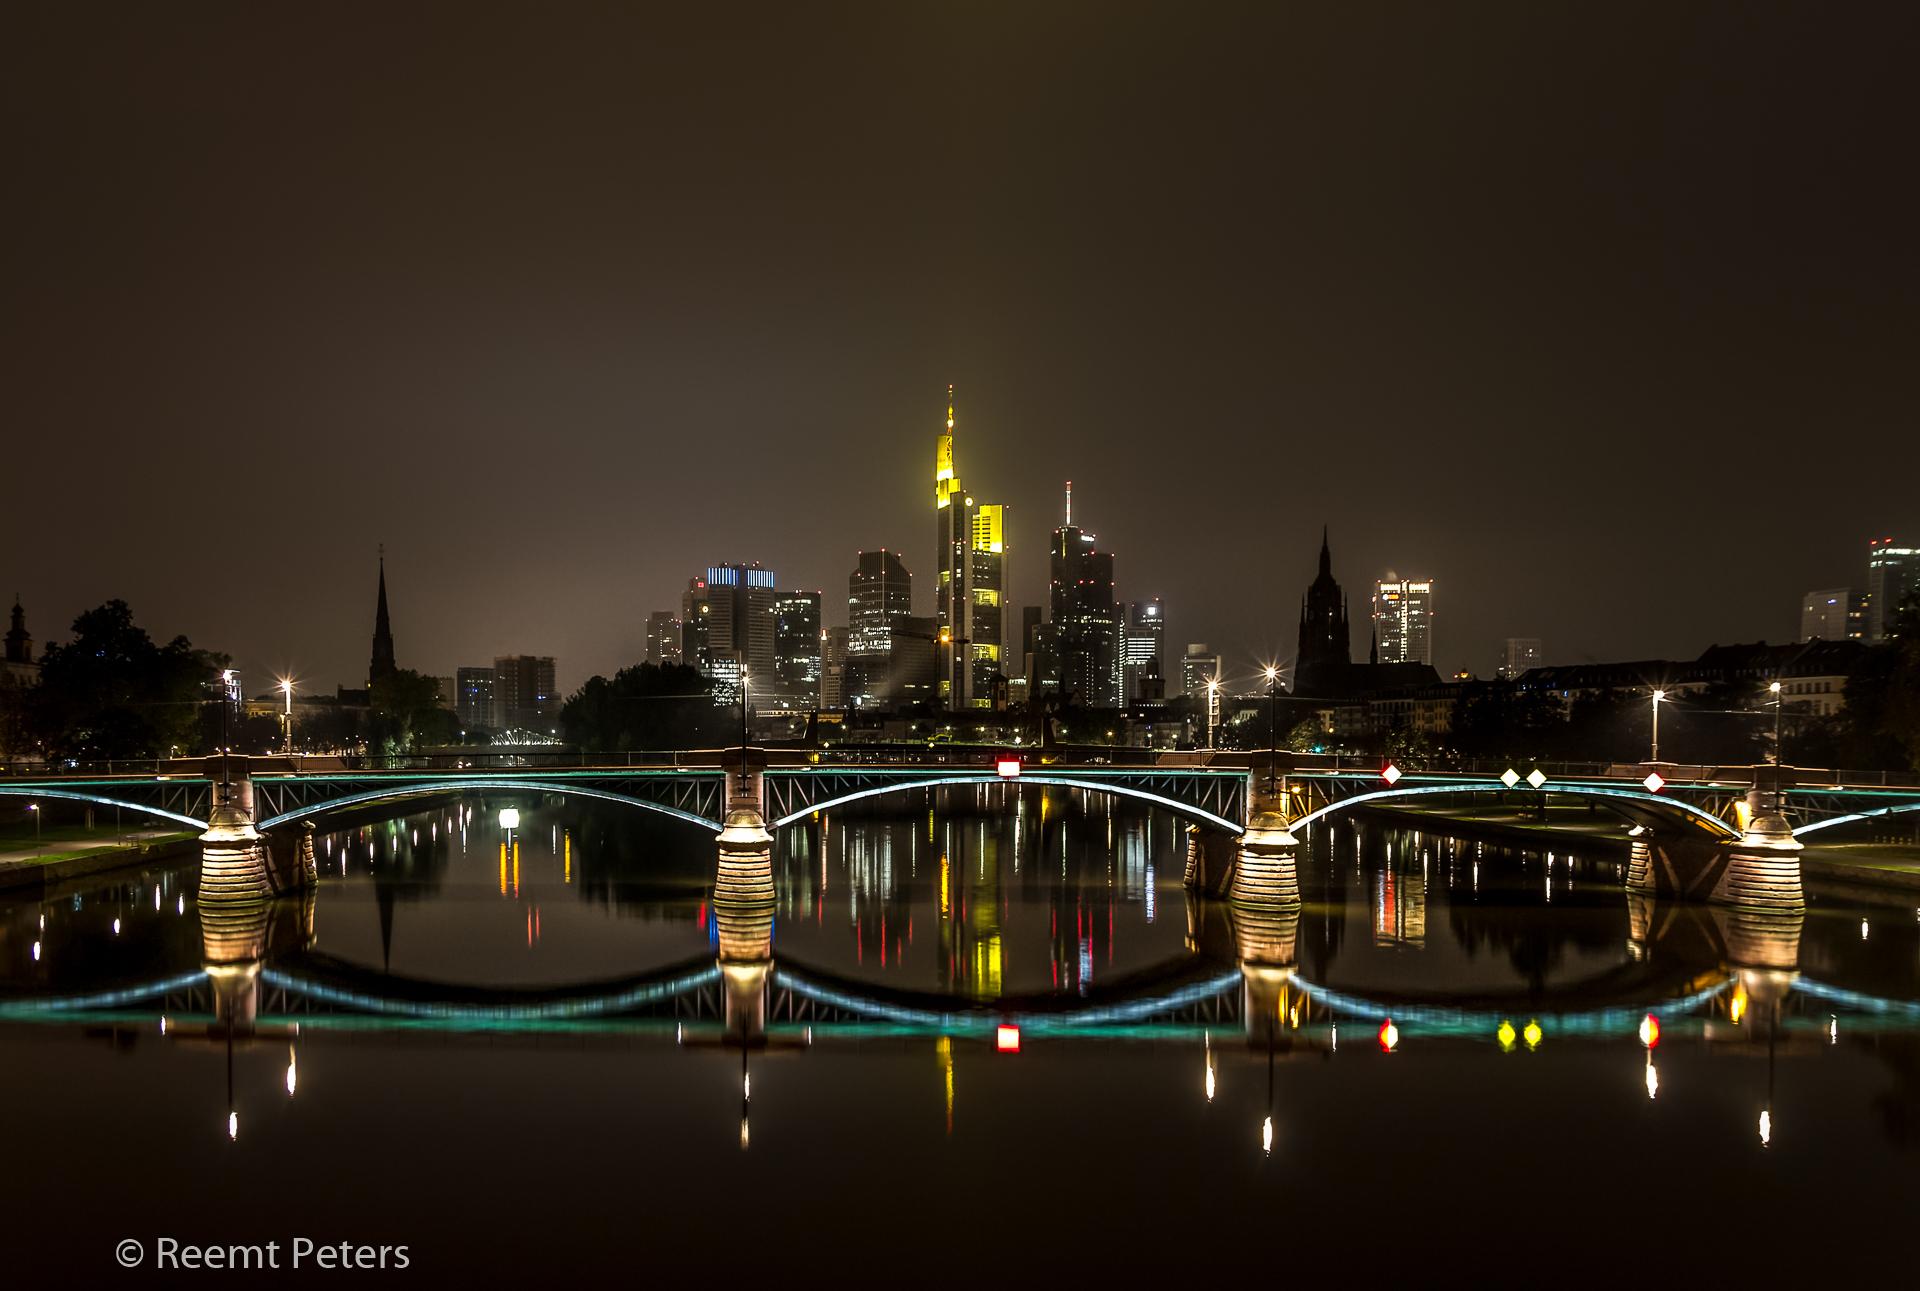 Frankfurt, Hessen, Germany